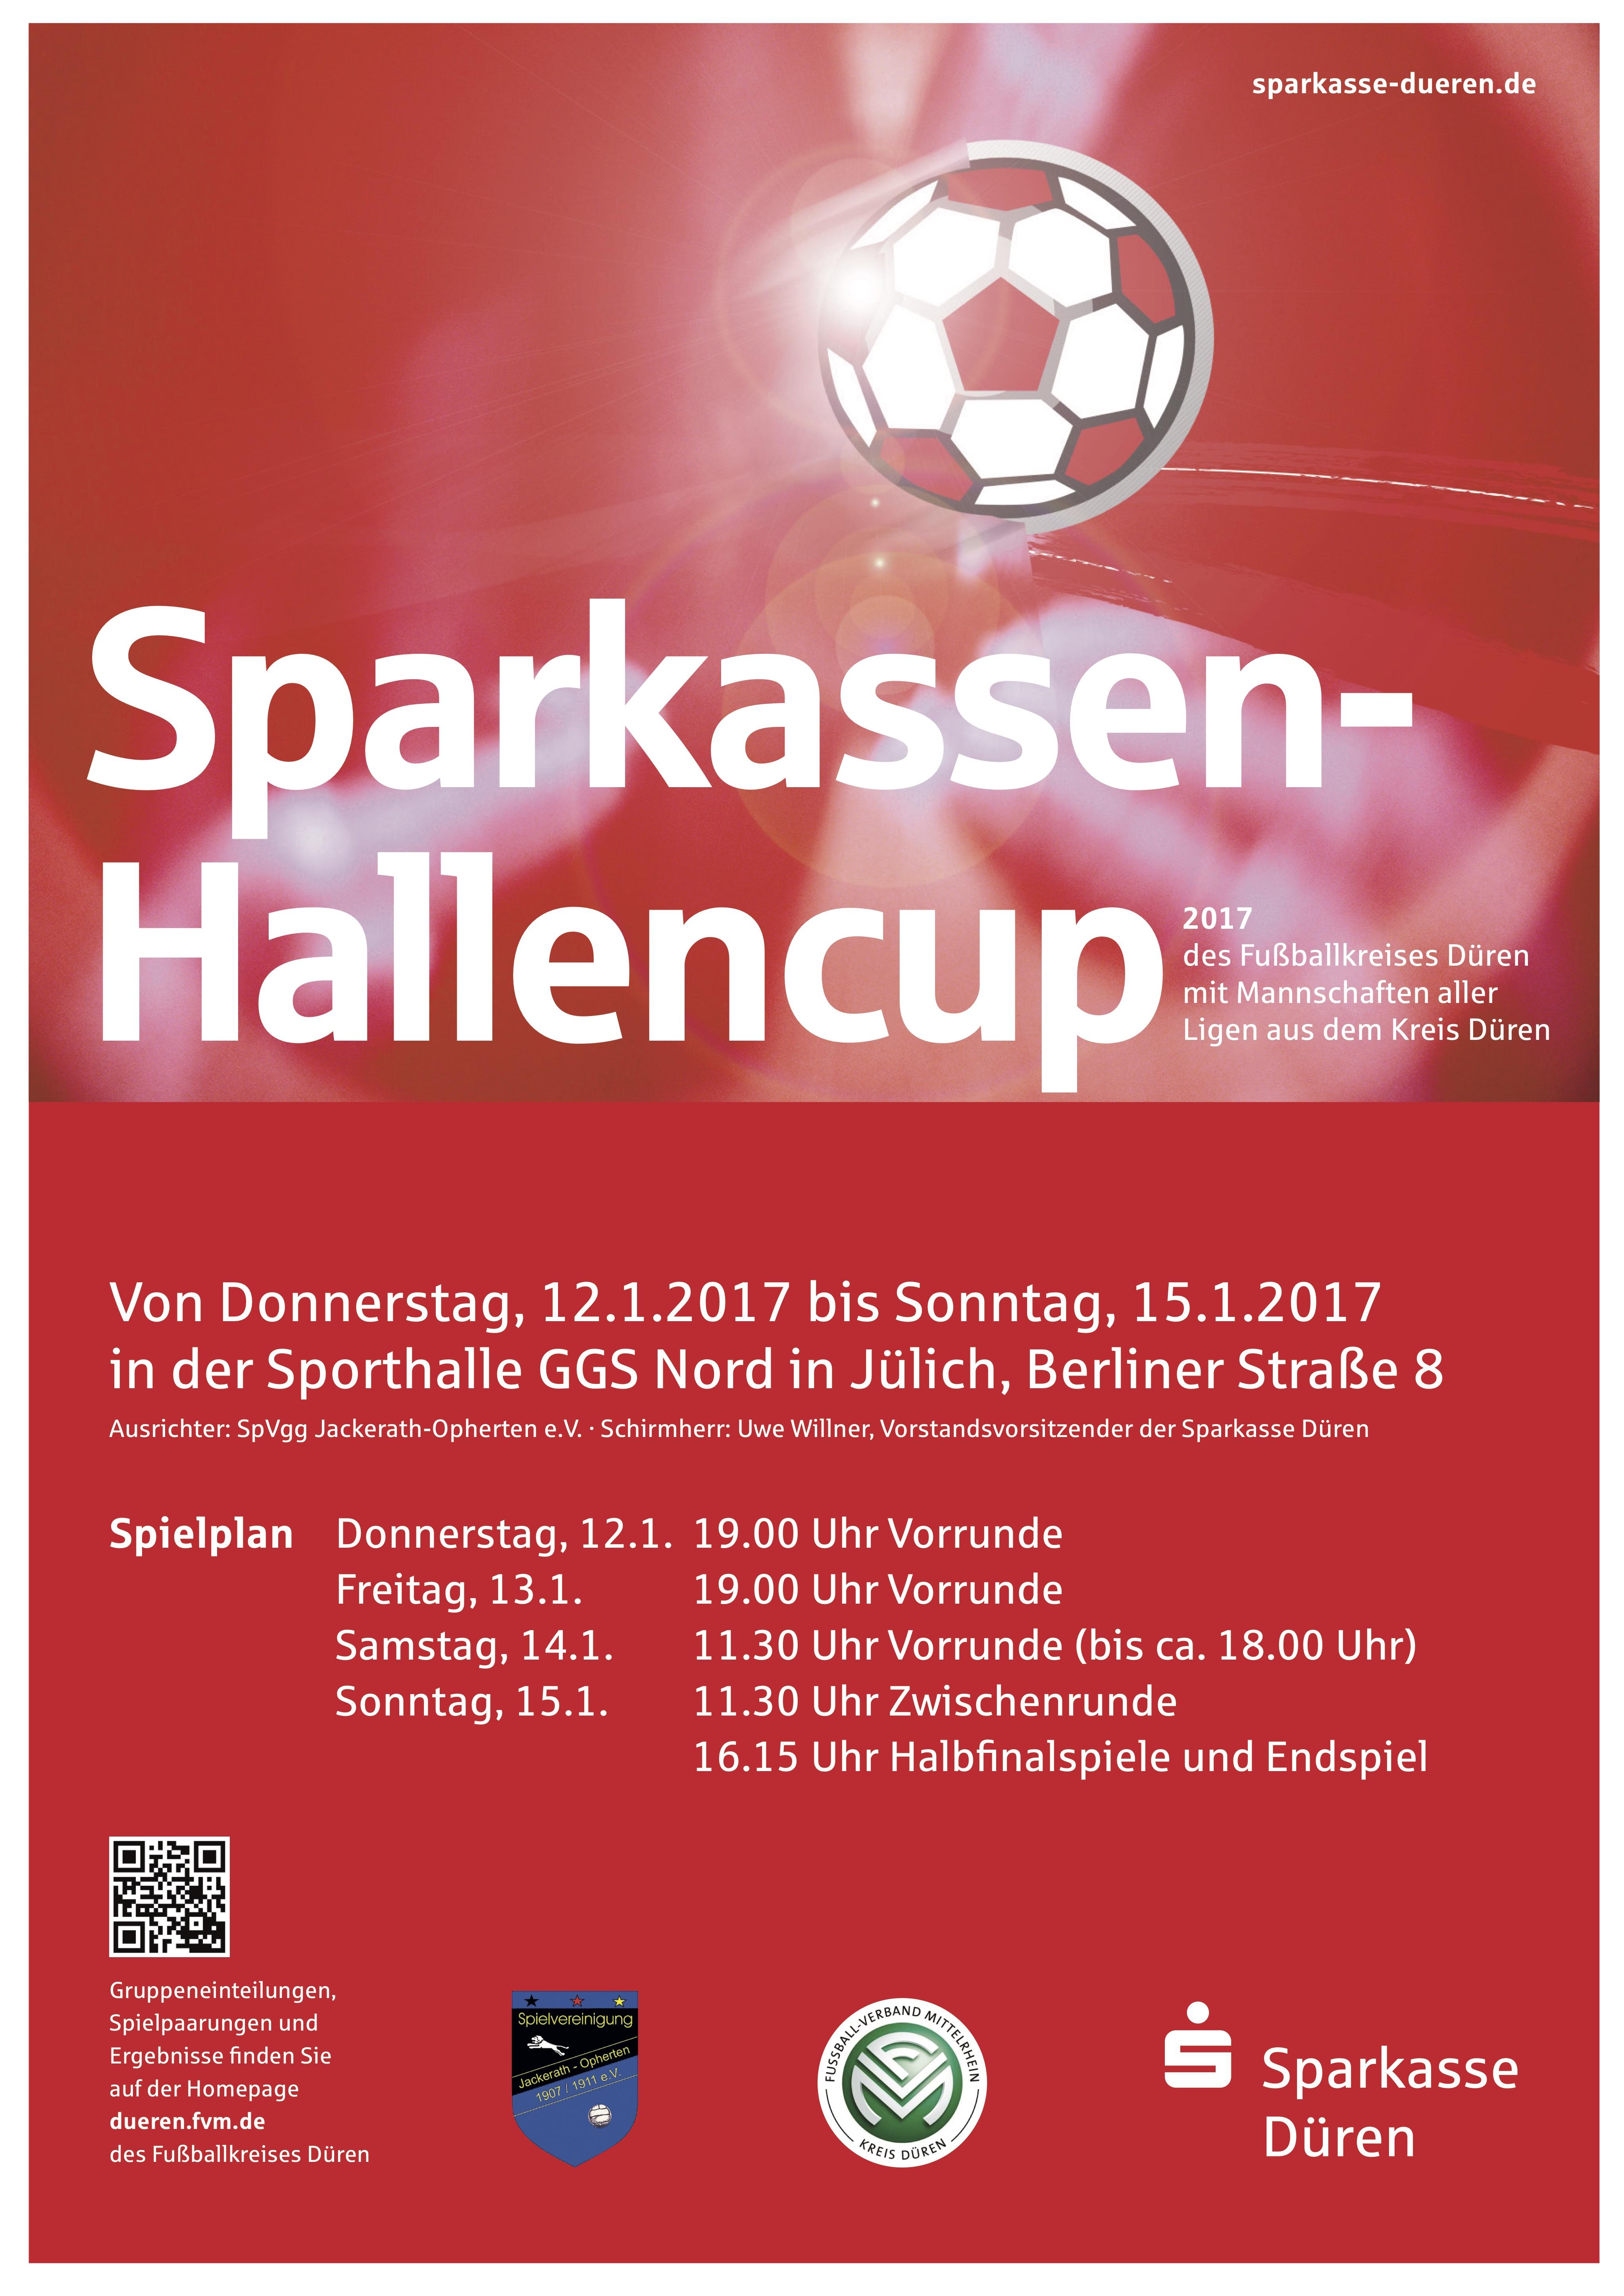 SKDN_SparkassenHallencup2017